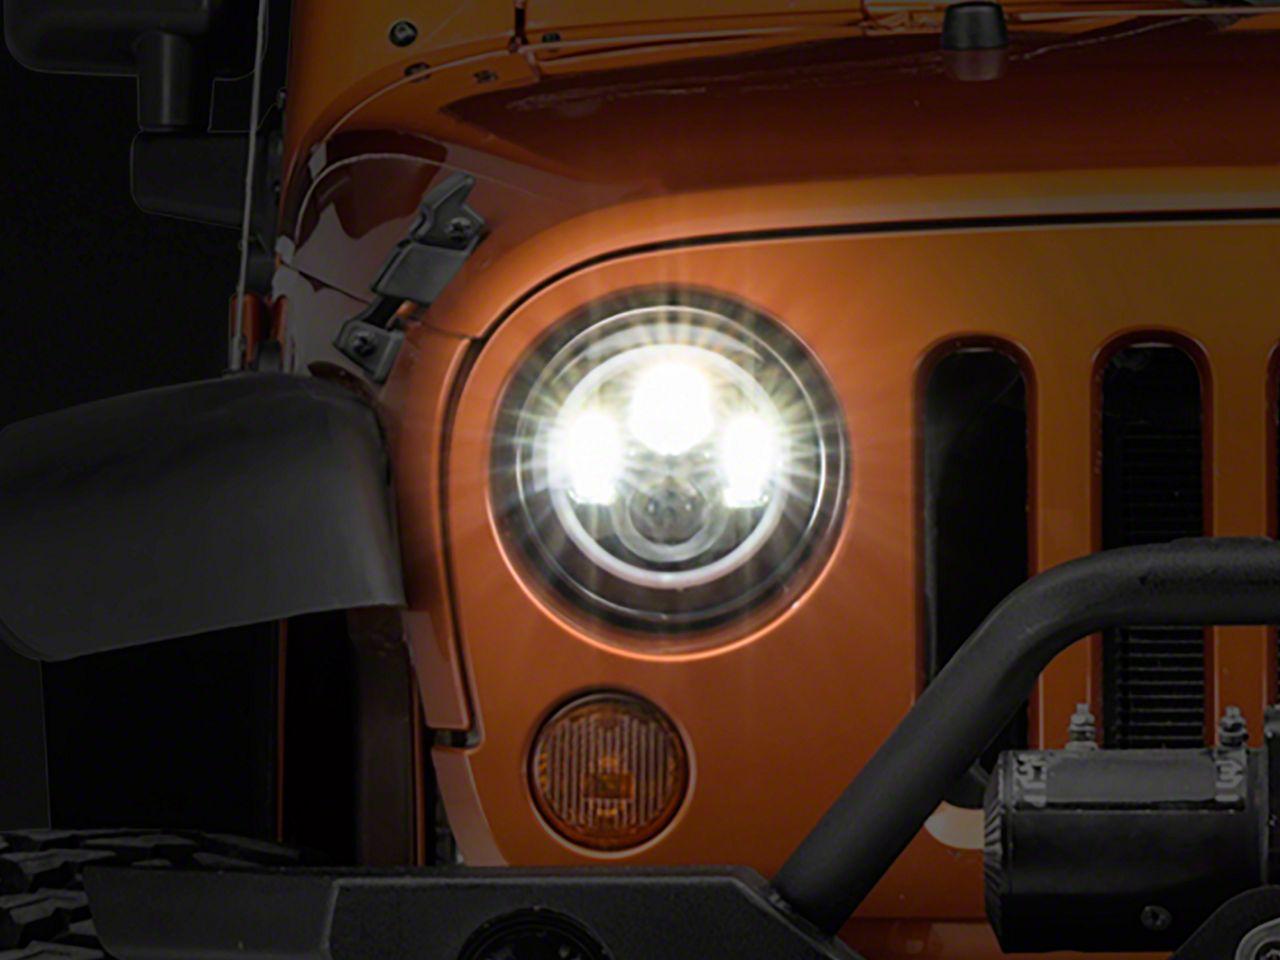 Led Halo Headlight Wiring Diagram - Wiring Diagram G11 Halo Hid Headlight Wiring Diagram on